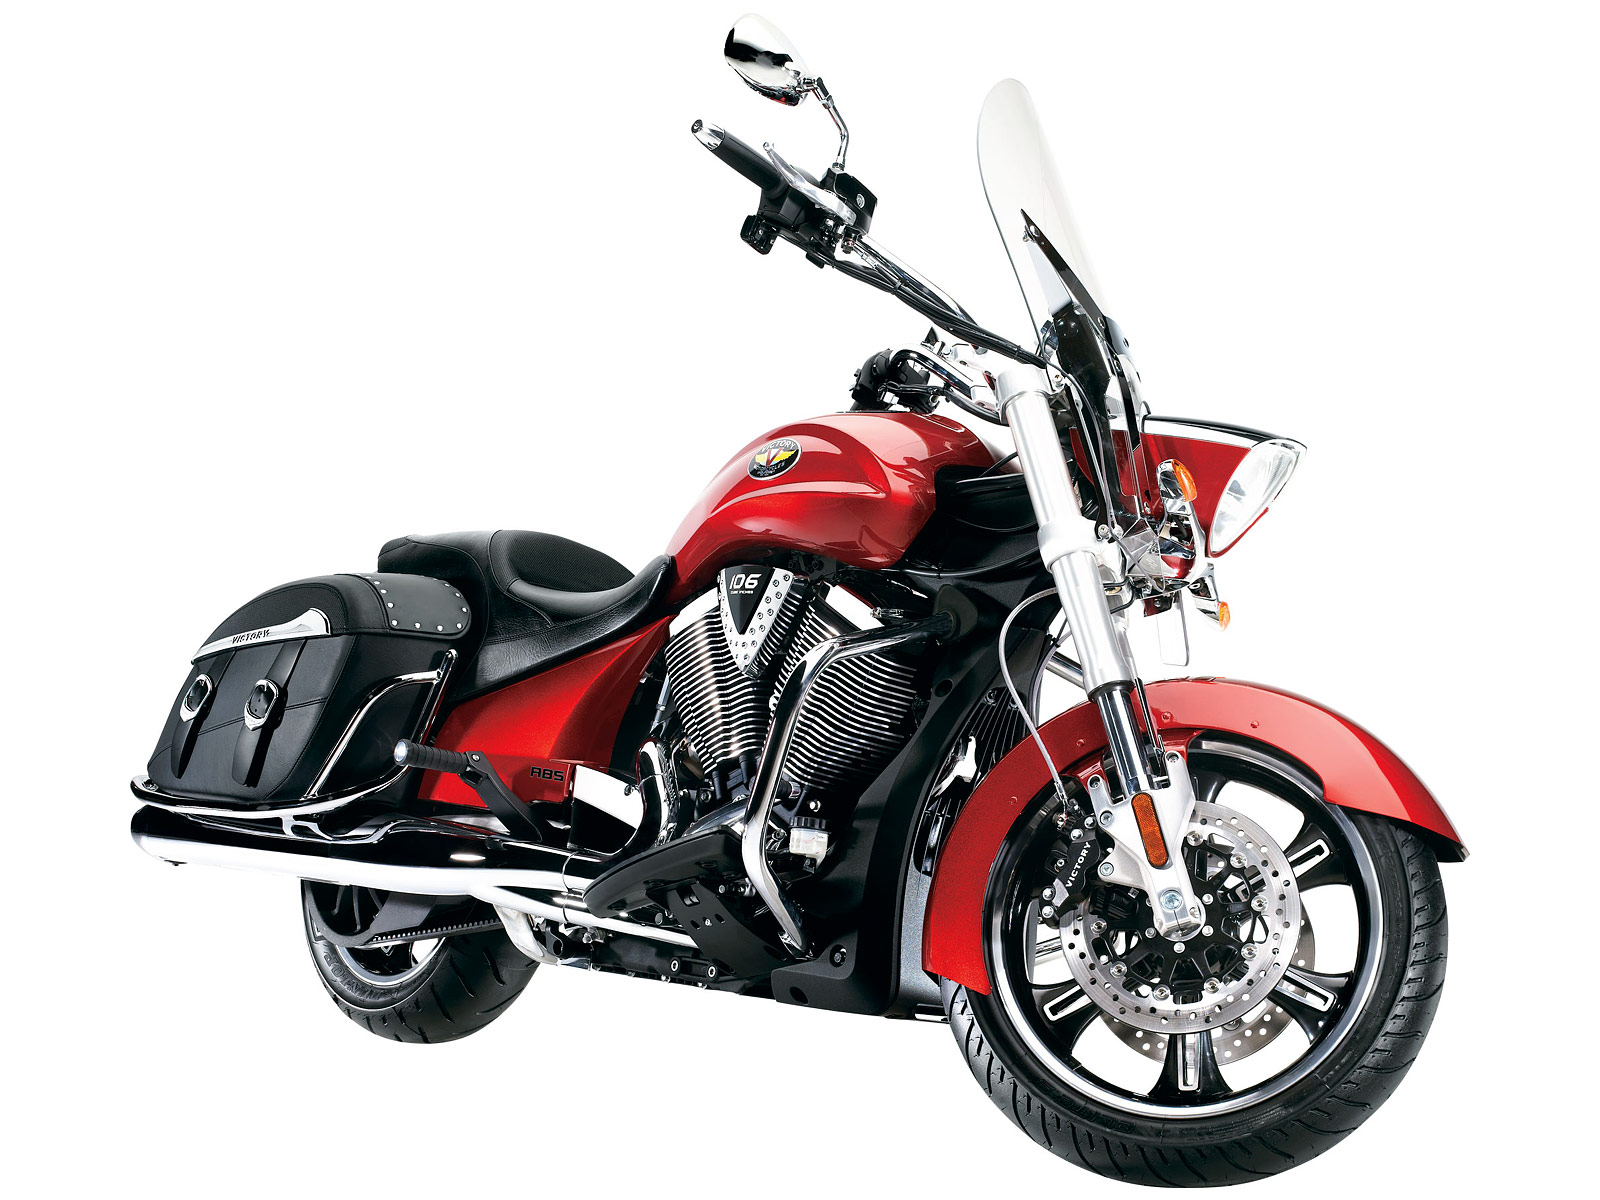 2012 Victory Cross Roads motorcycle desktop wallpaper 2jpg 1600x1200